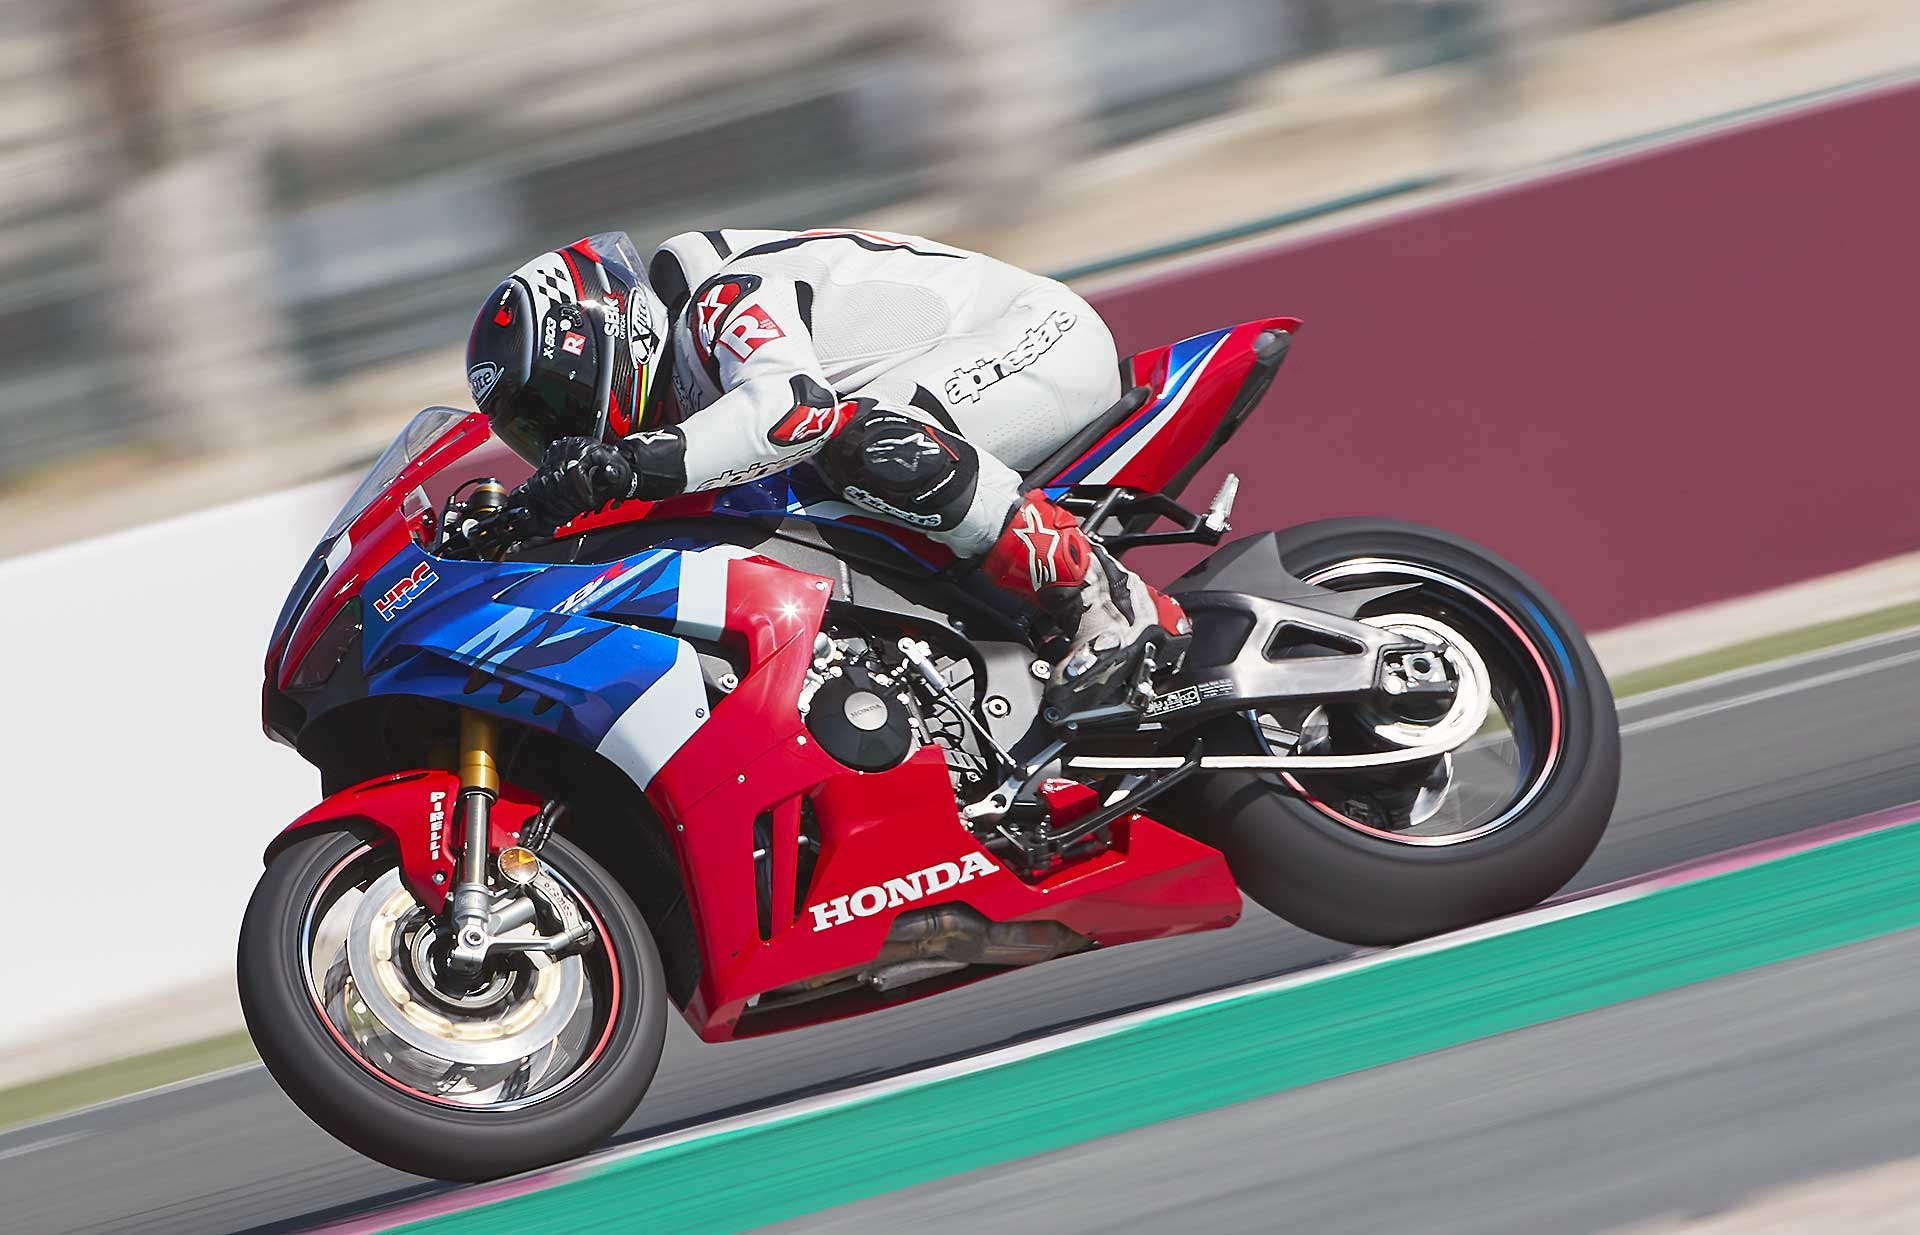 Honda CBR1000RR-R Freblade 2020